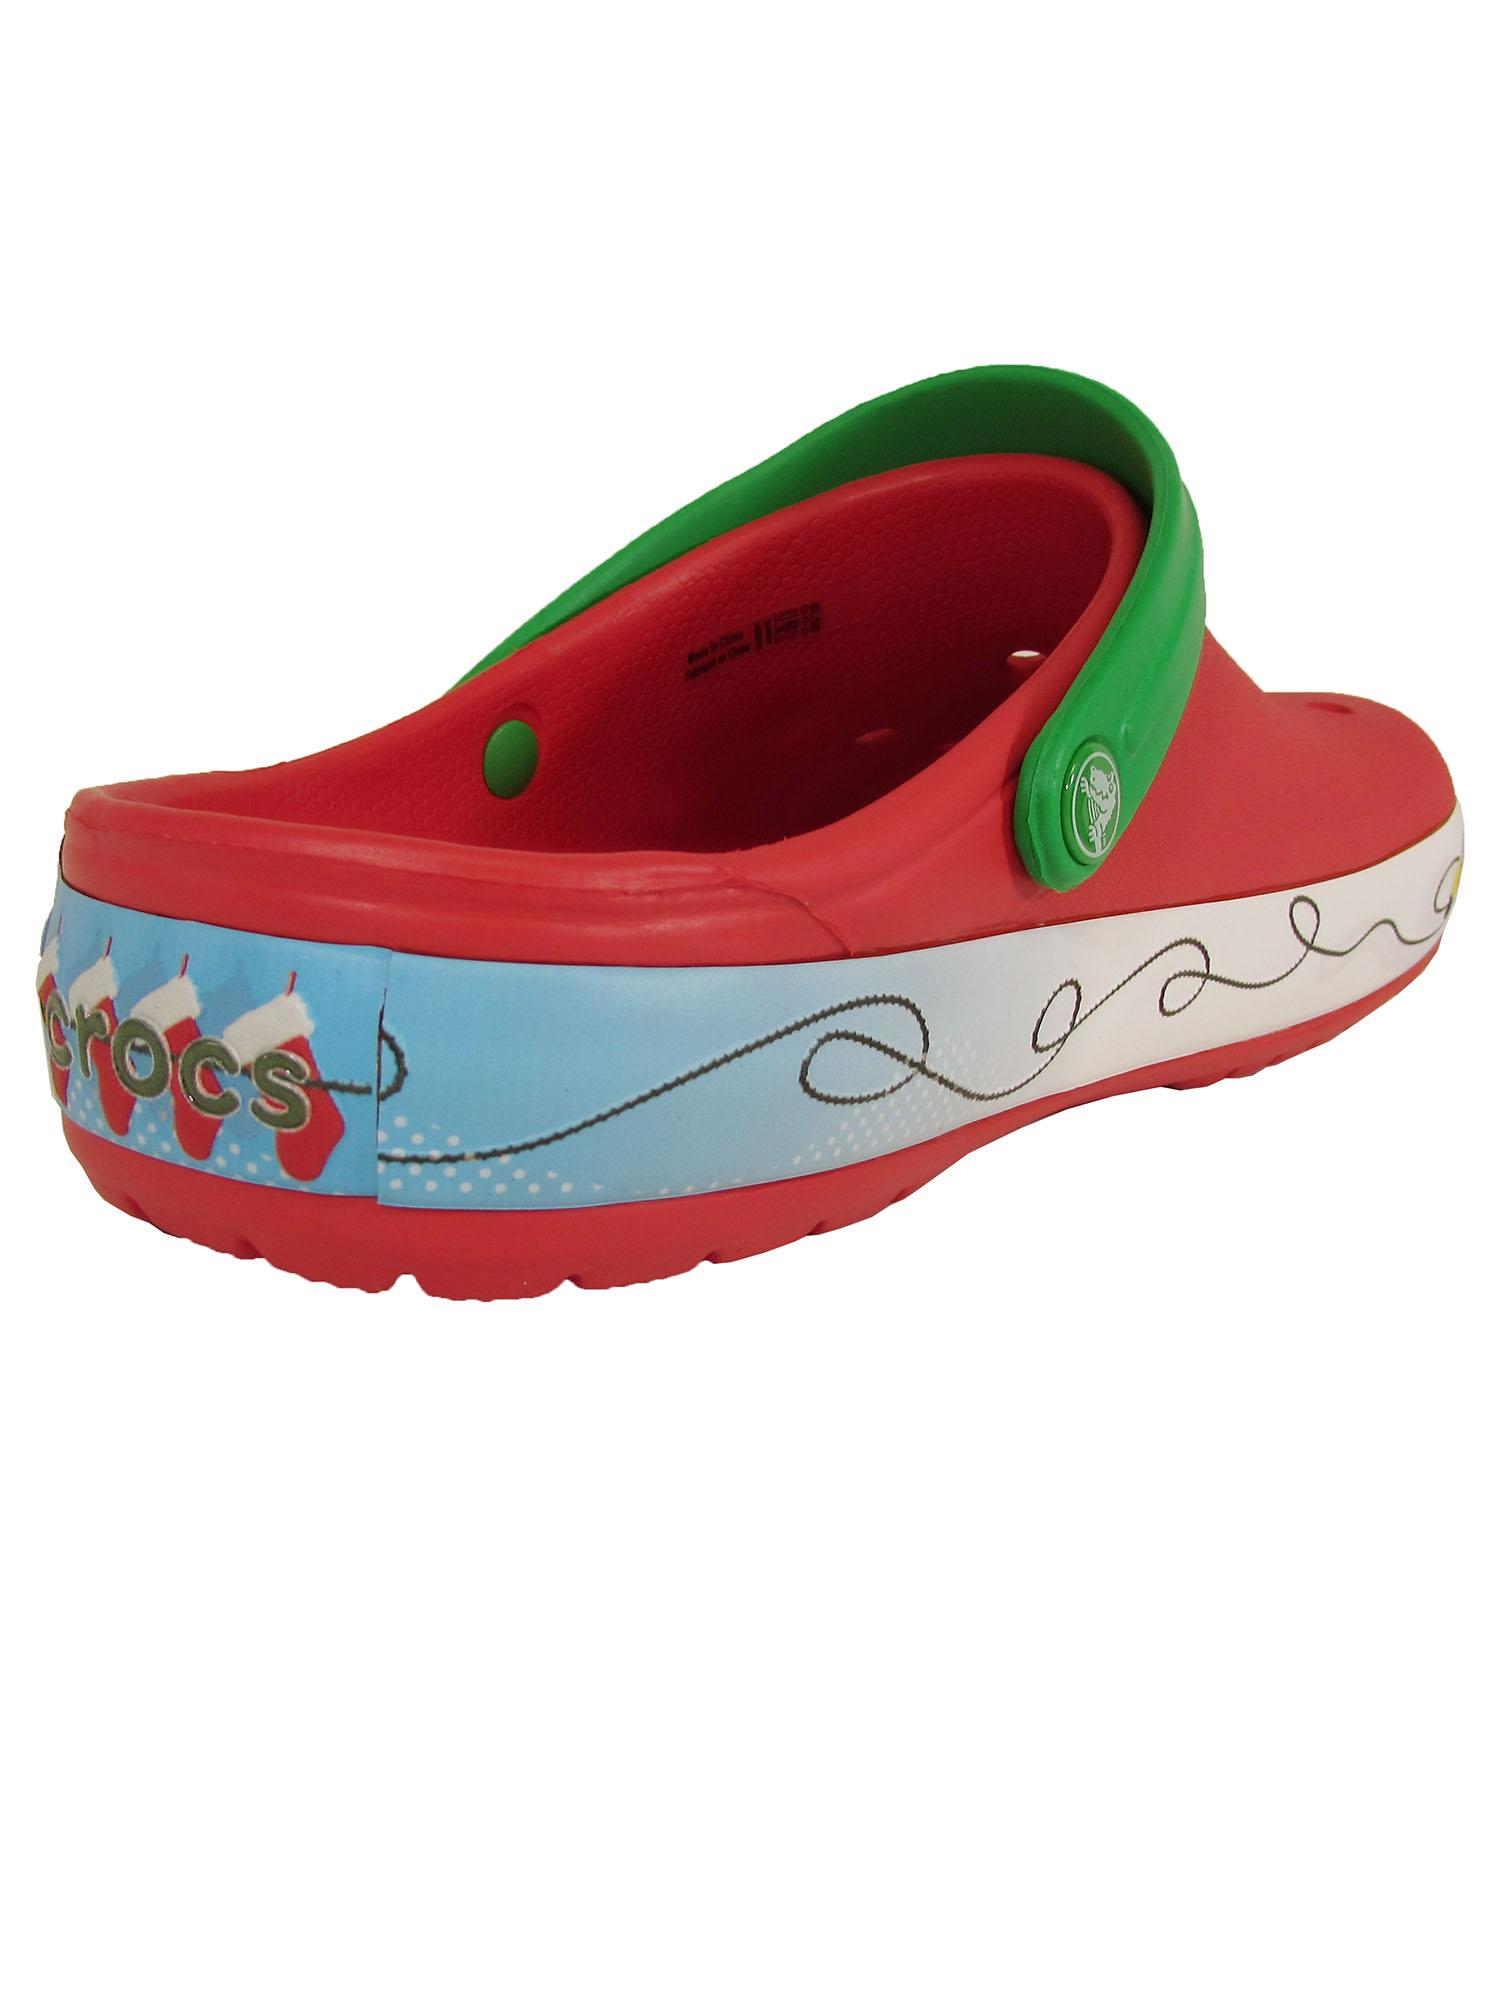 353d04ddcf8c2 Crocs Crocband Holiday Lights Clog